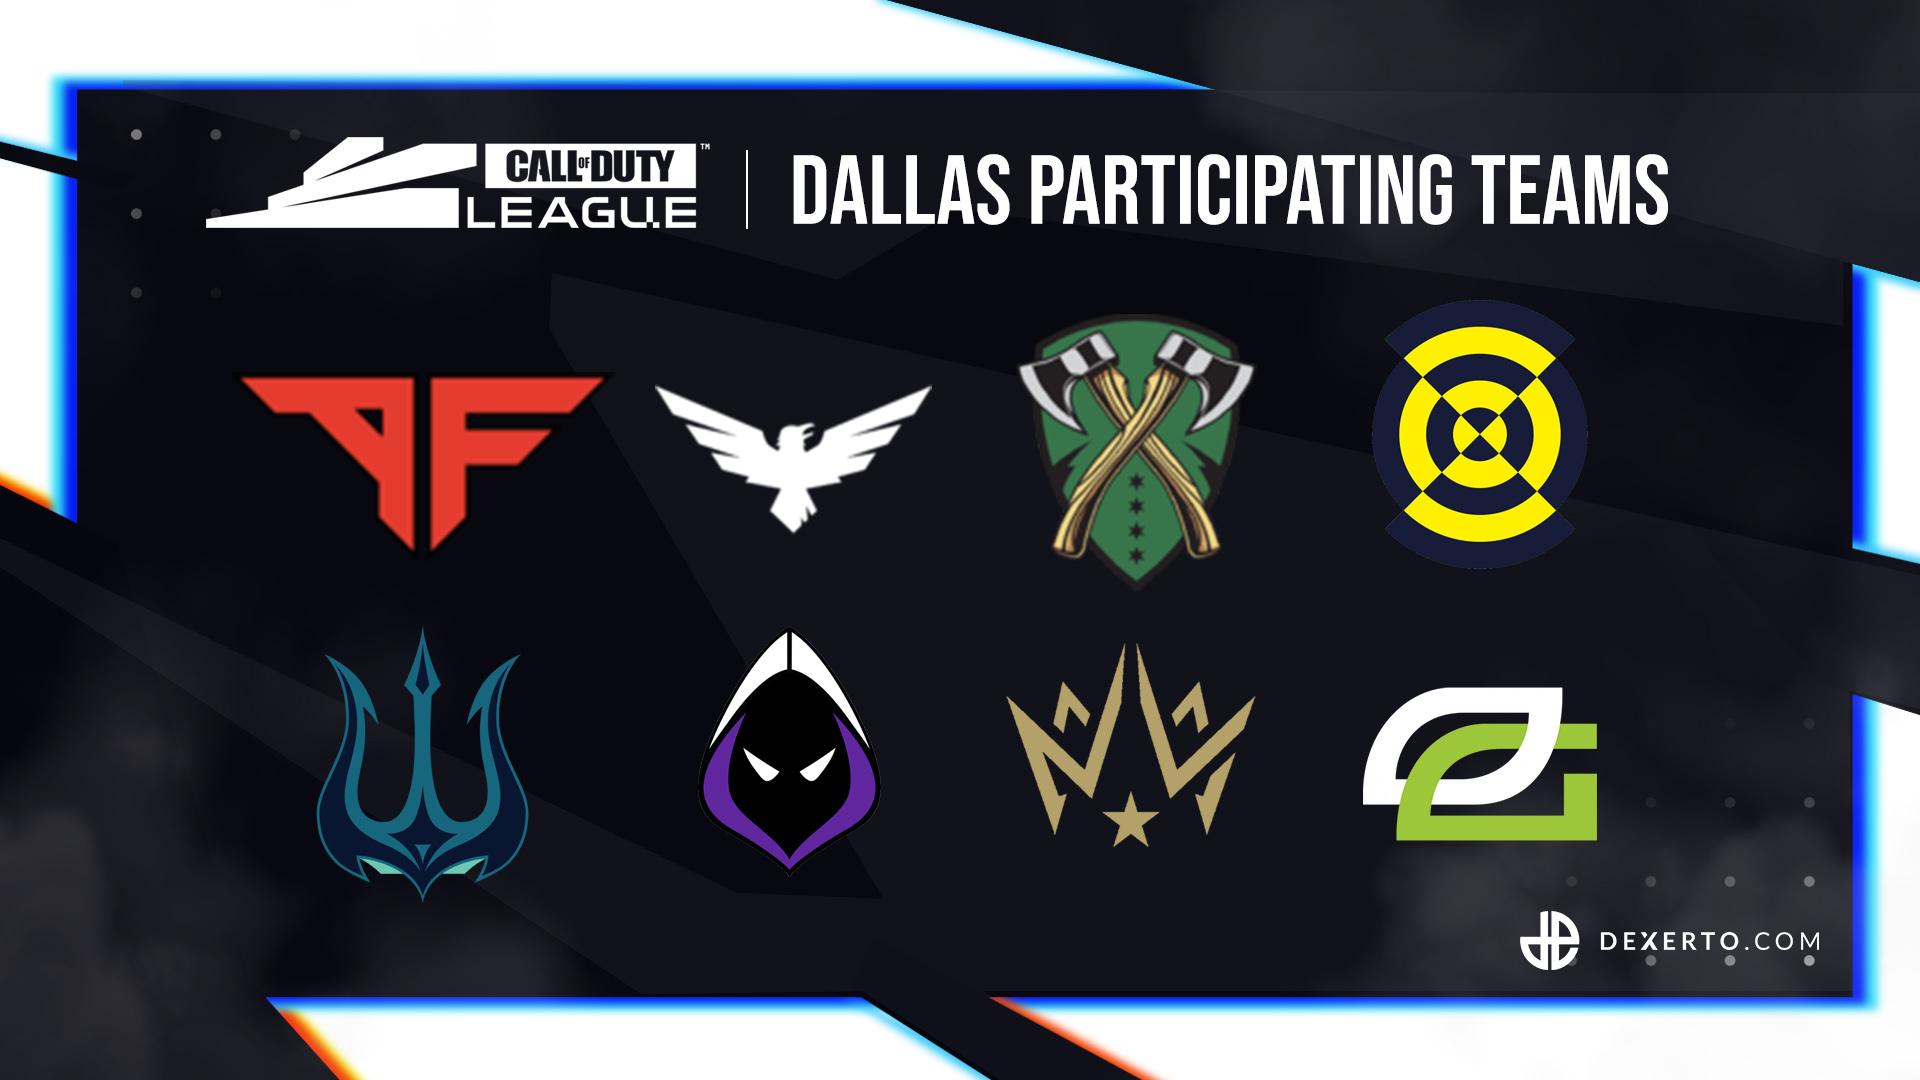 CDL Chicago participating teams.